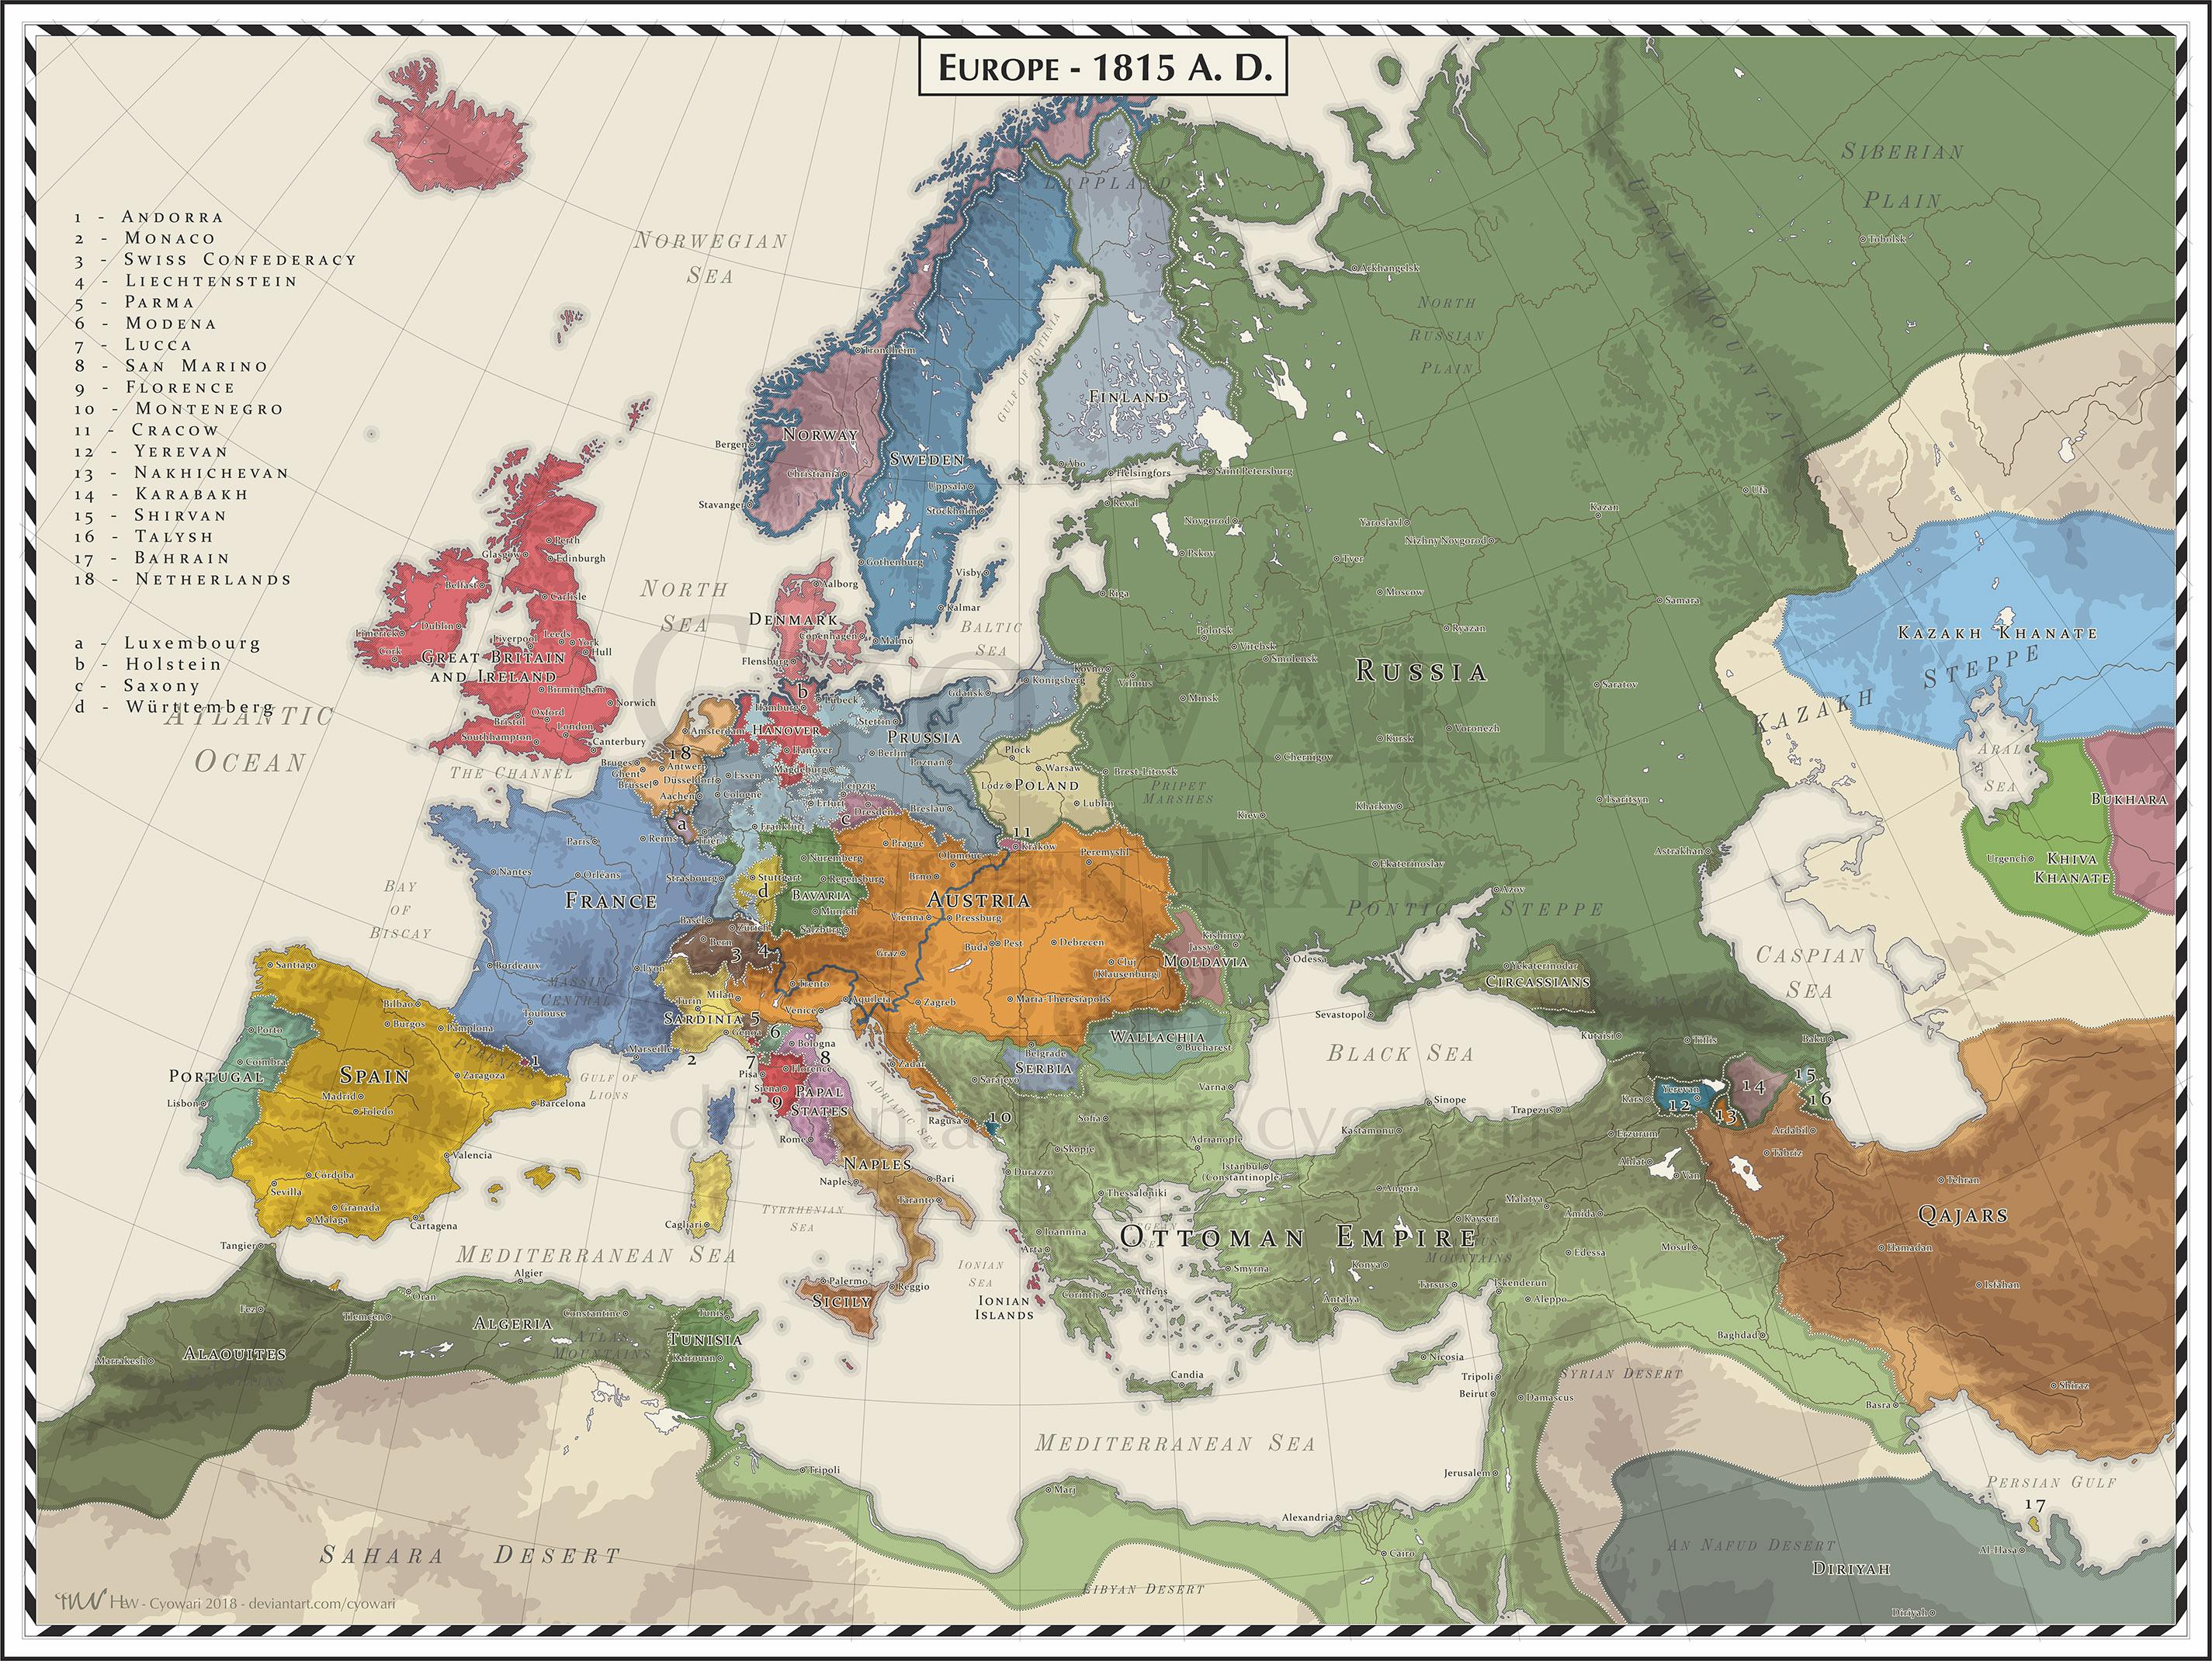 Europe 1815 by Cyowari on DeviantArt